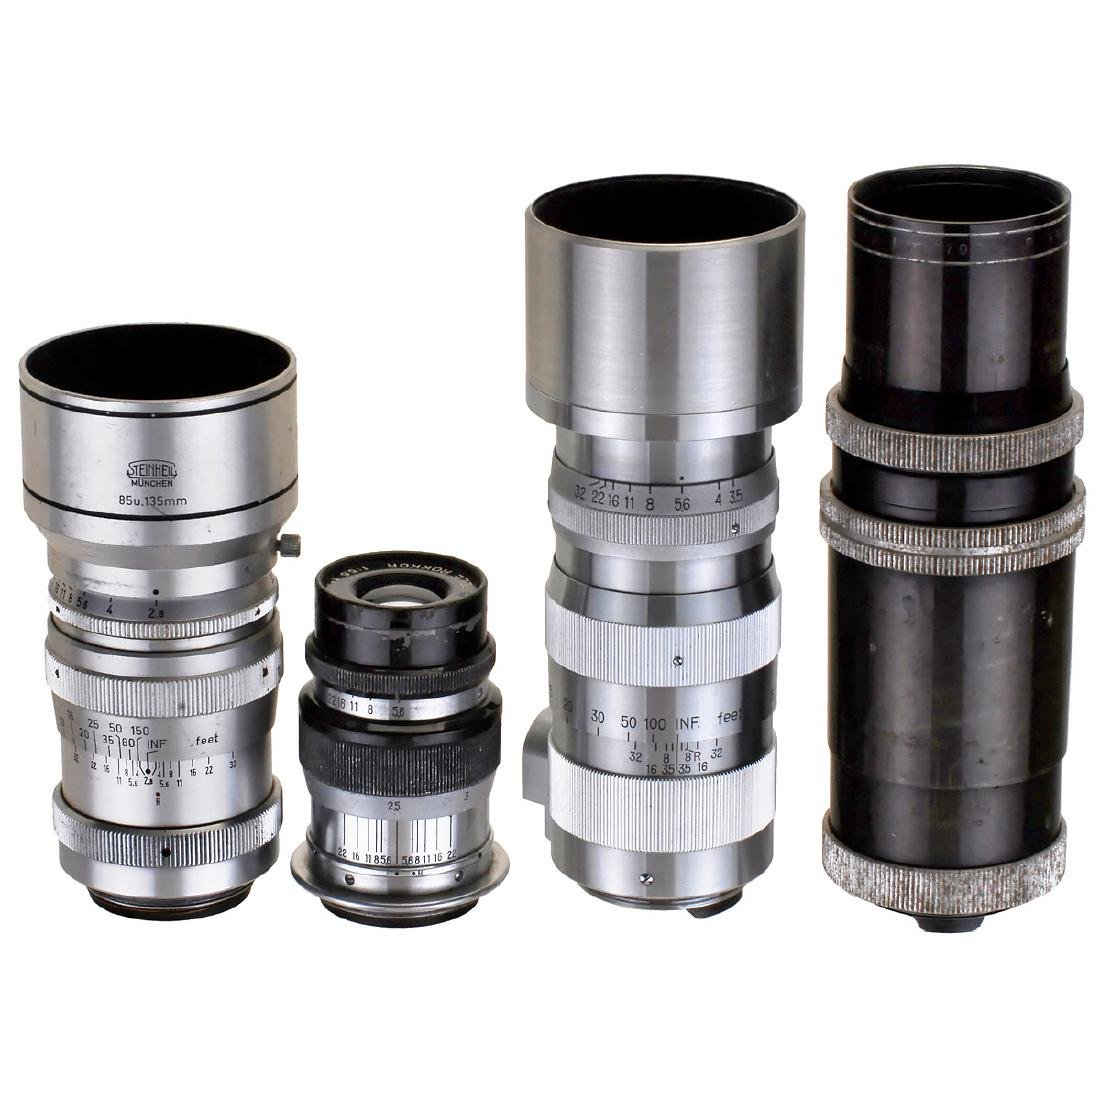 Screw-Mount Lenses for Leica M39